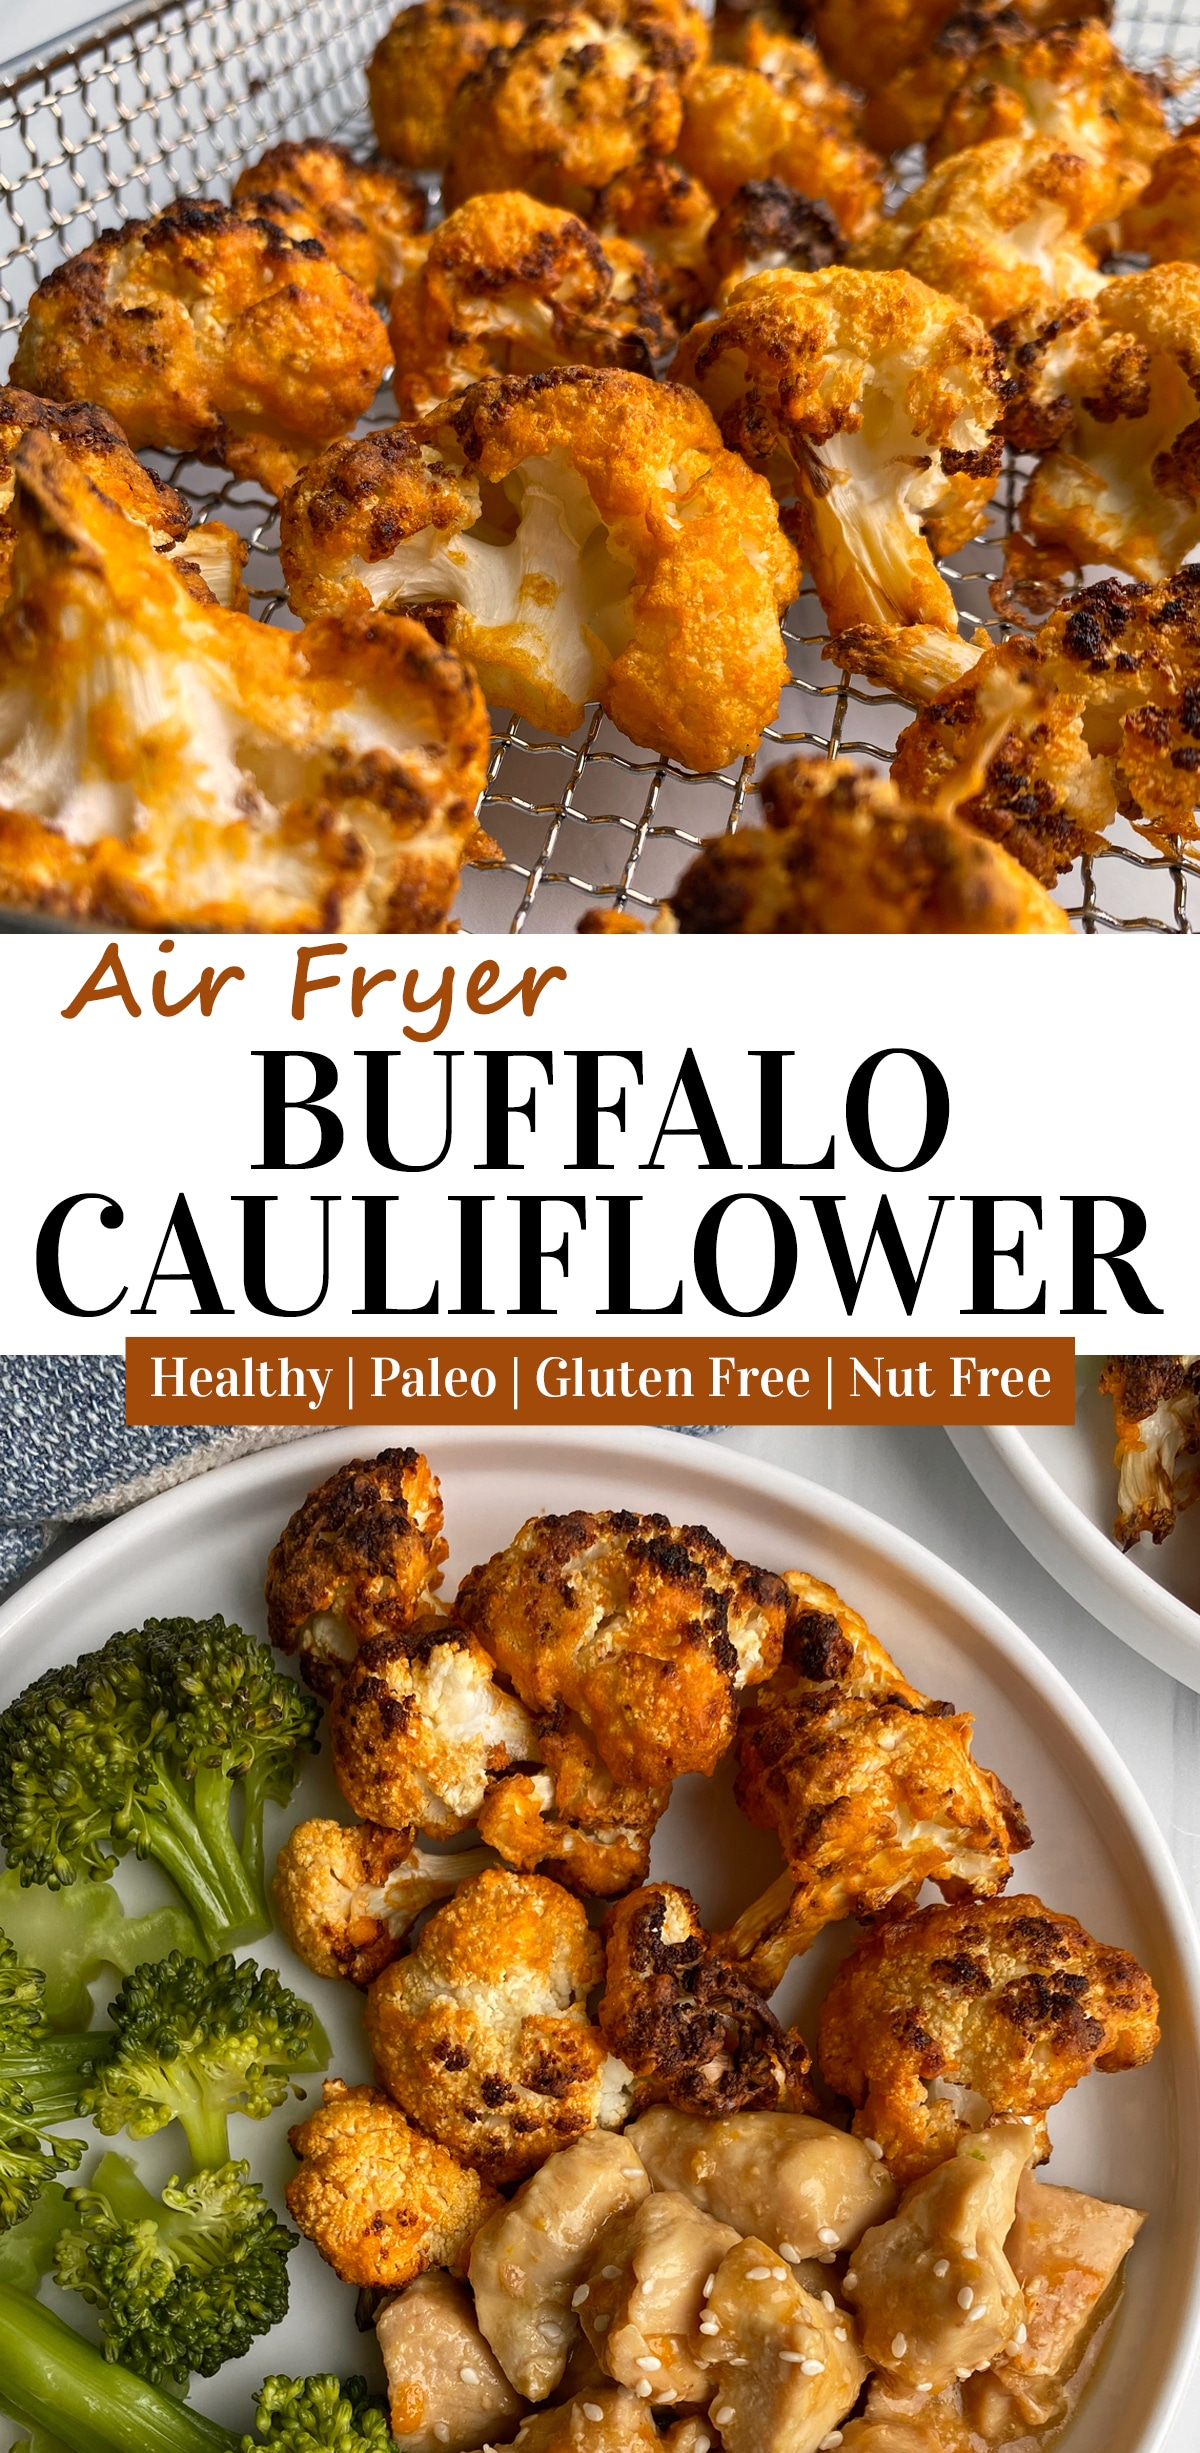 paleo-air-fryer-buffalo-cauliflower-recipe-pinterest-image